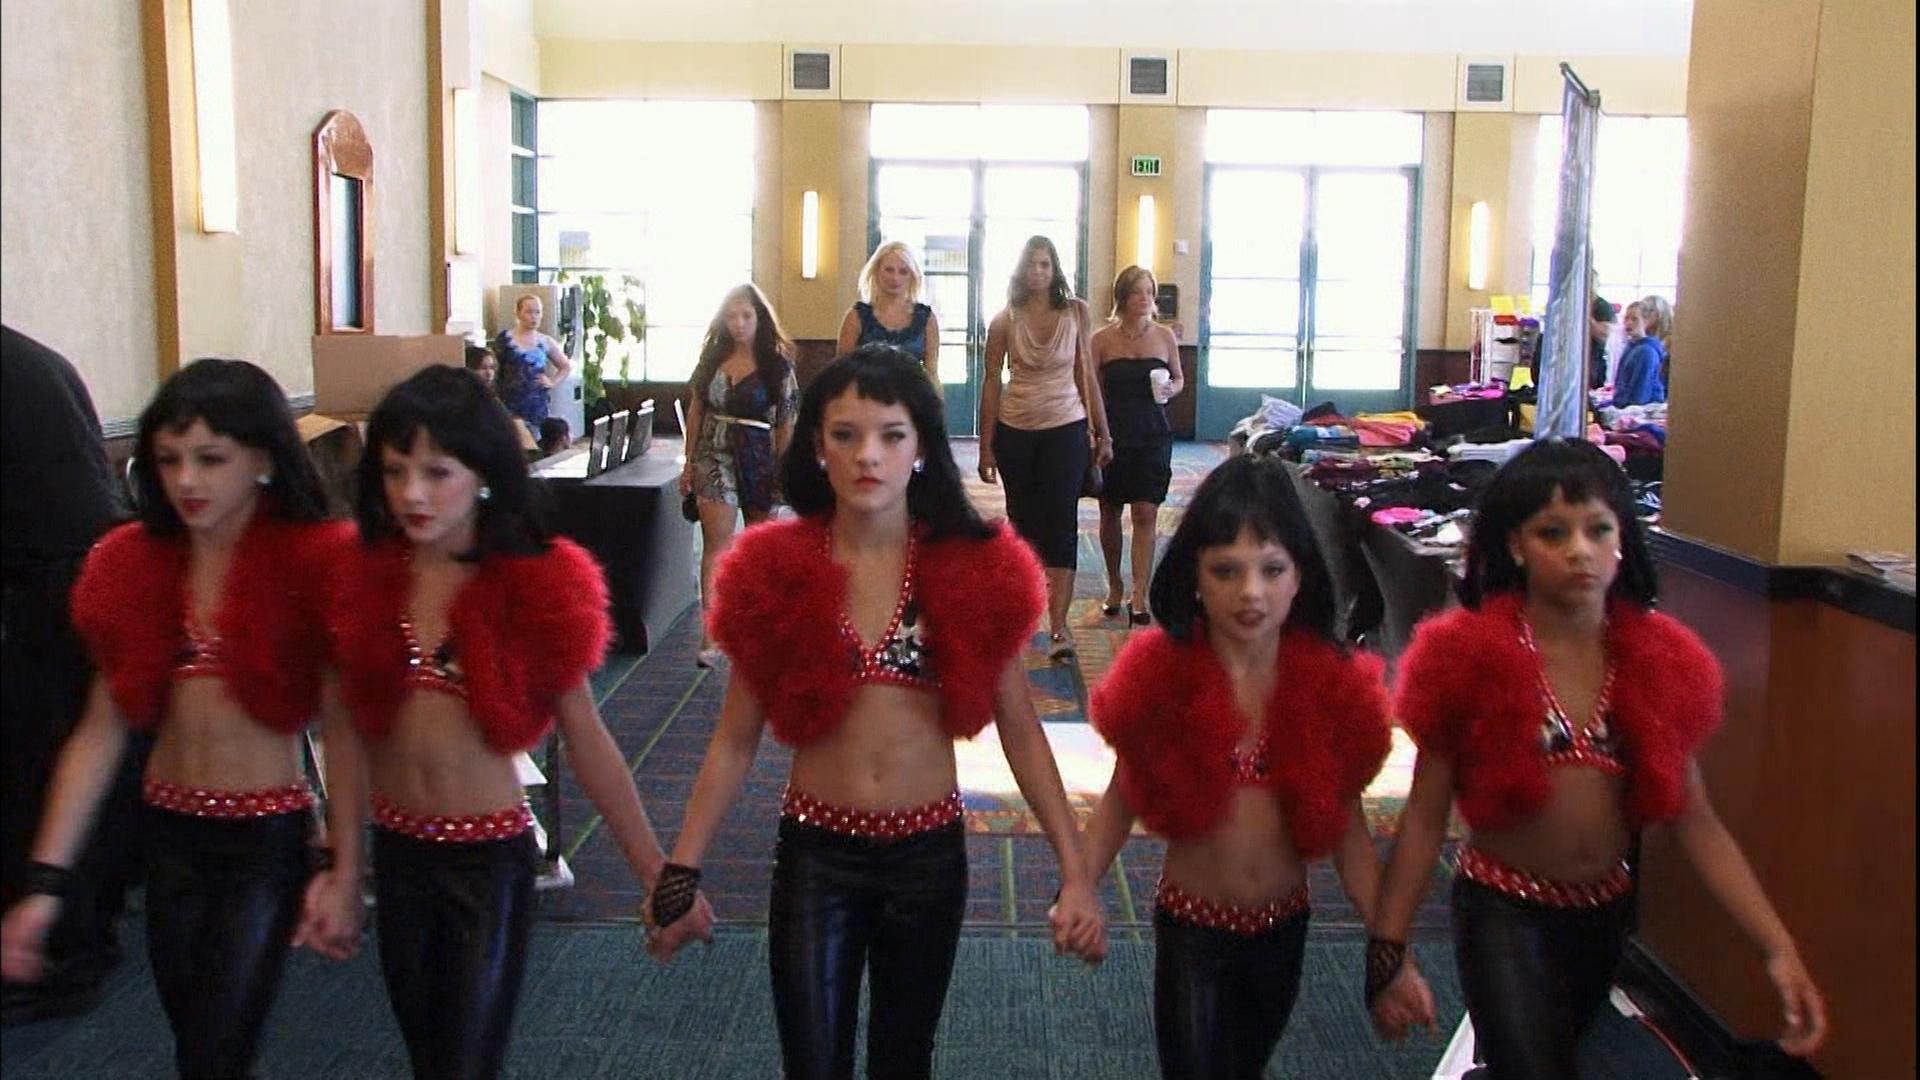 Watch Cathy Brings It On Full Episode Dance Moms Lifetime